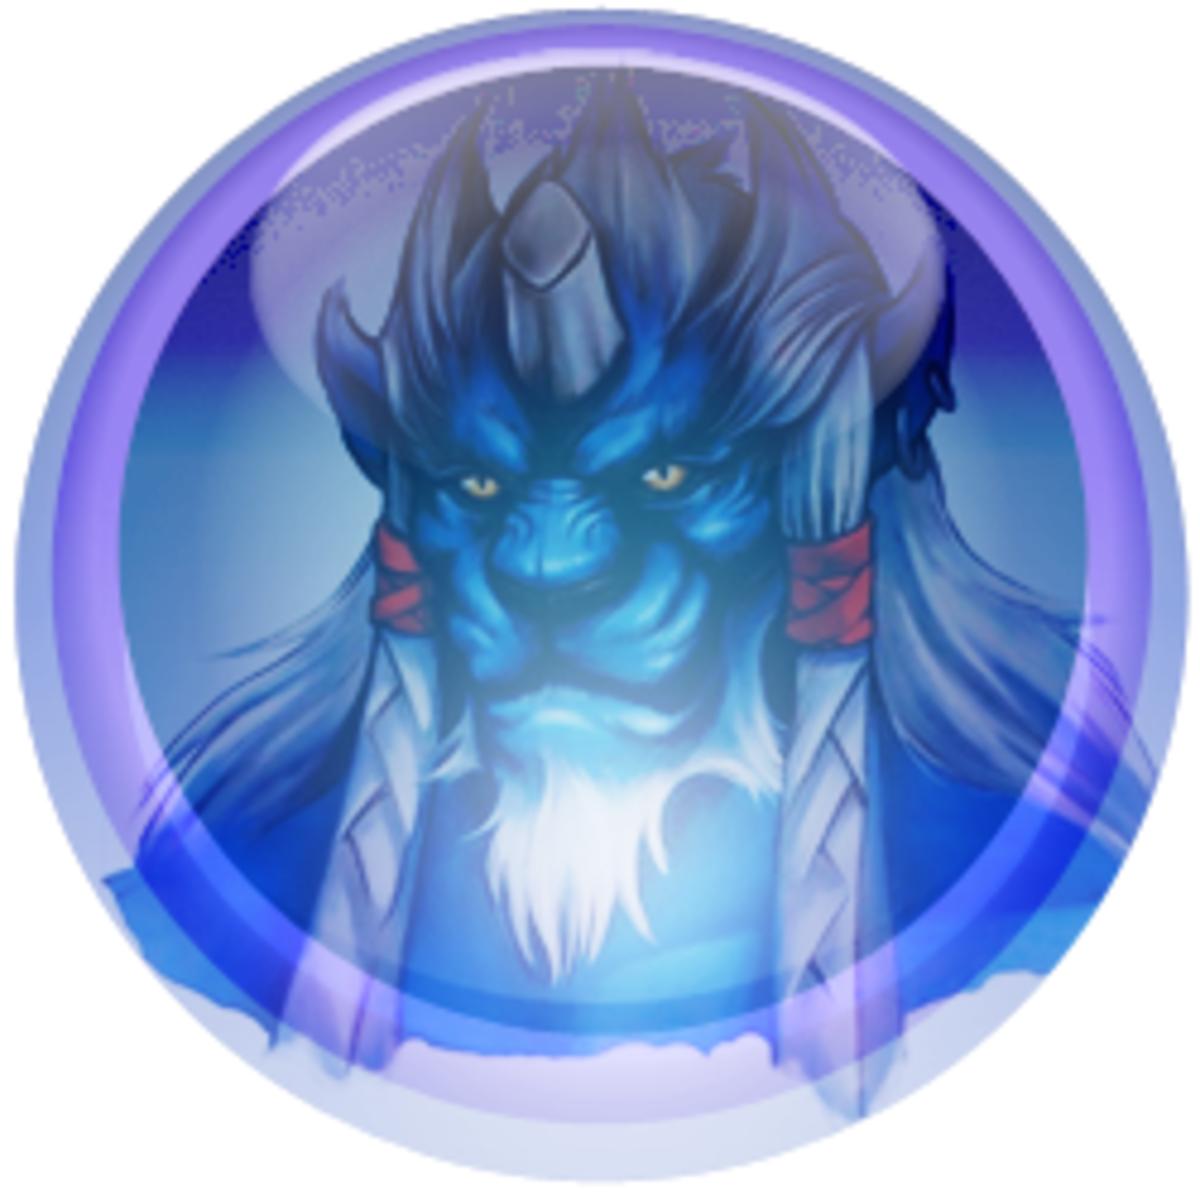 Kimahri: Spirit Lance